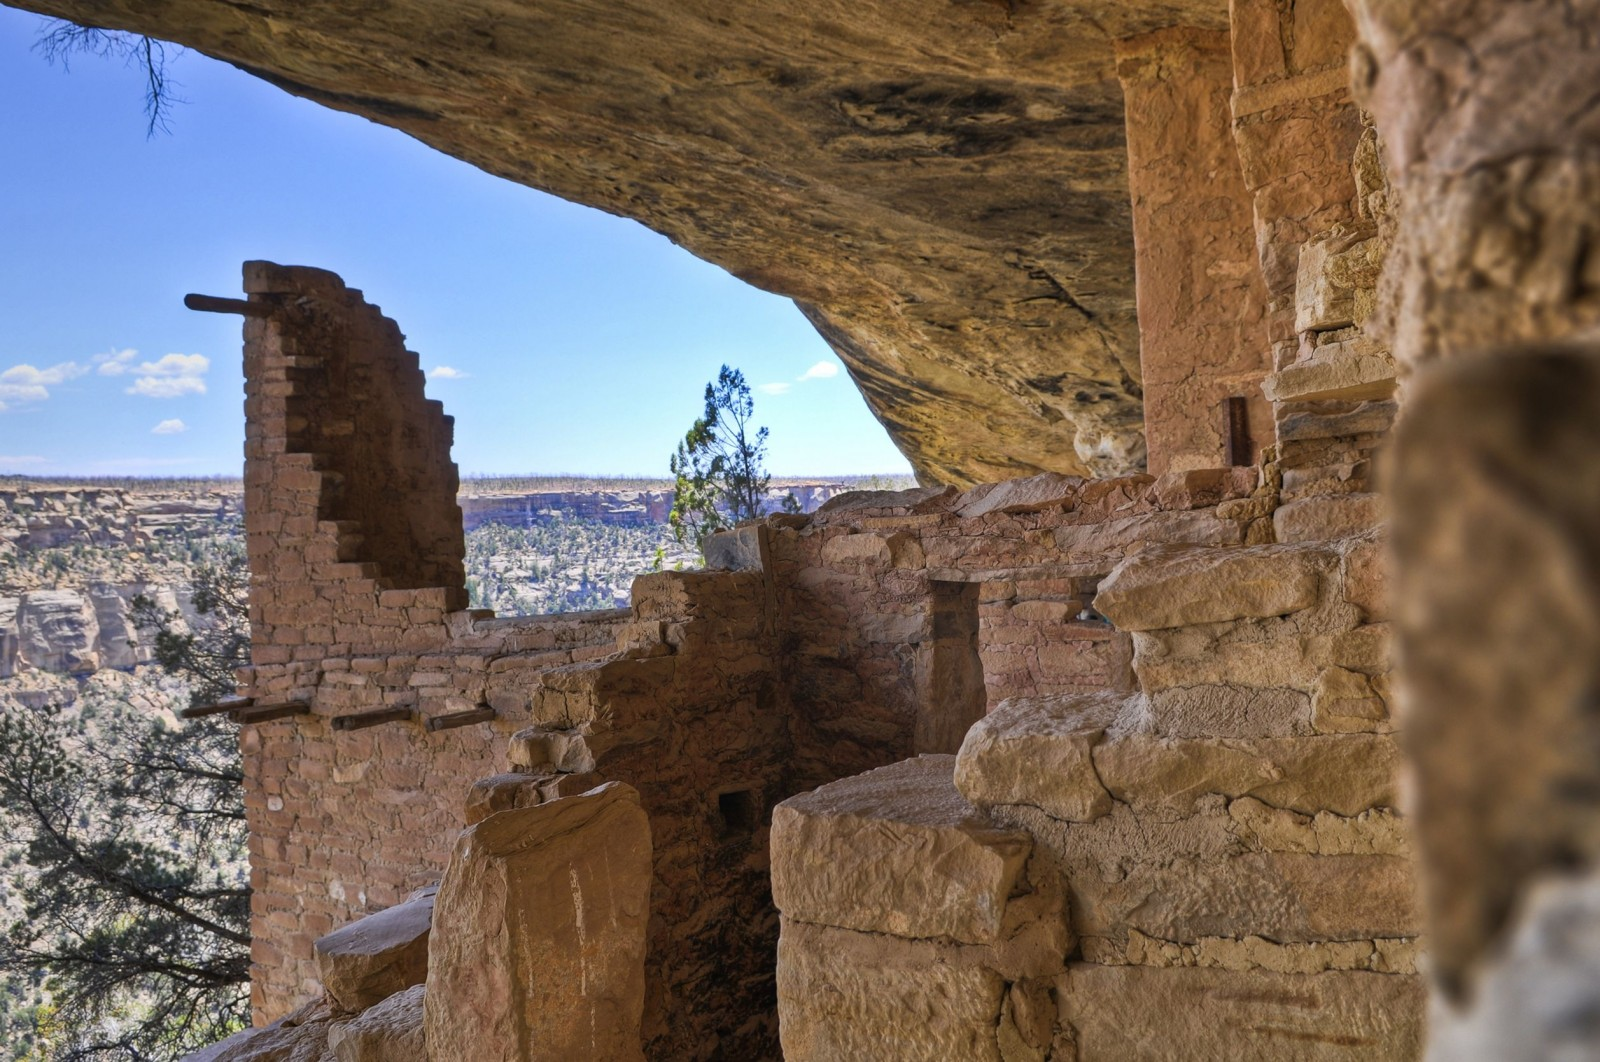 The Fall Film Wallpaper Hidden Architecture Mesa Verde